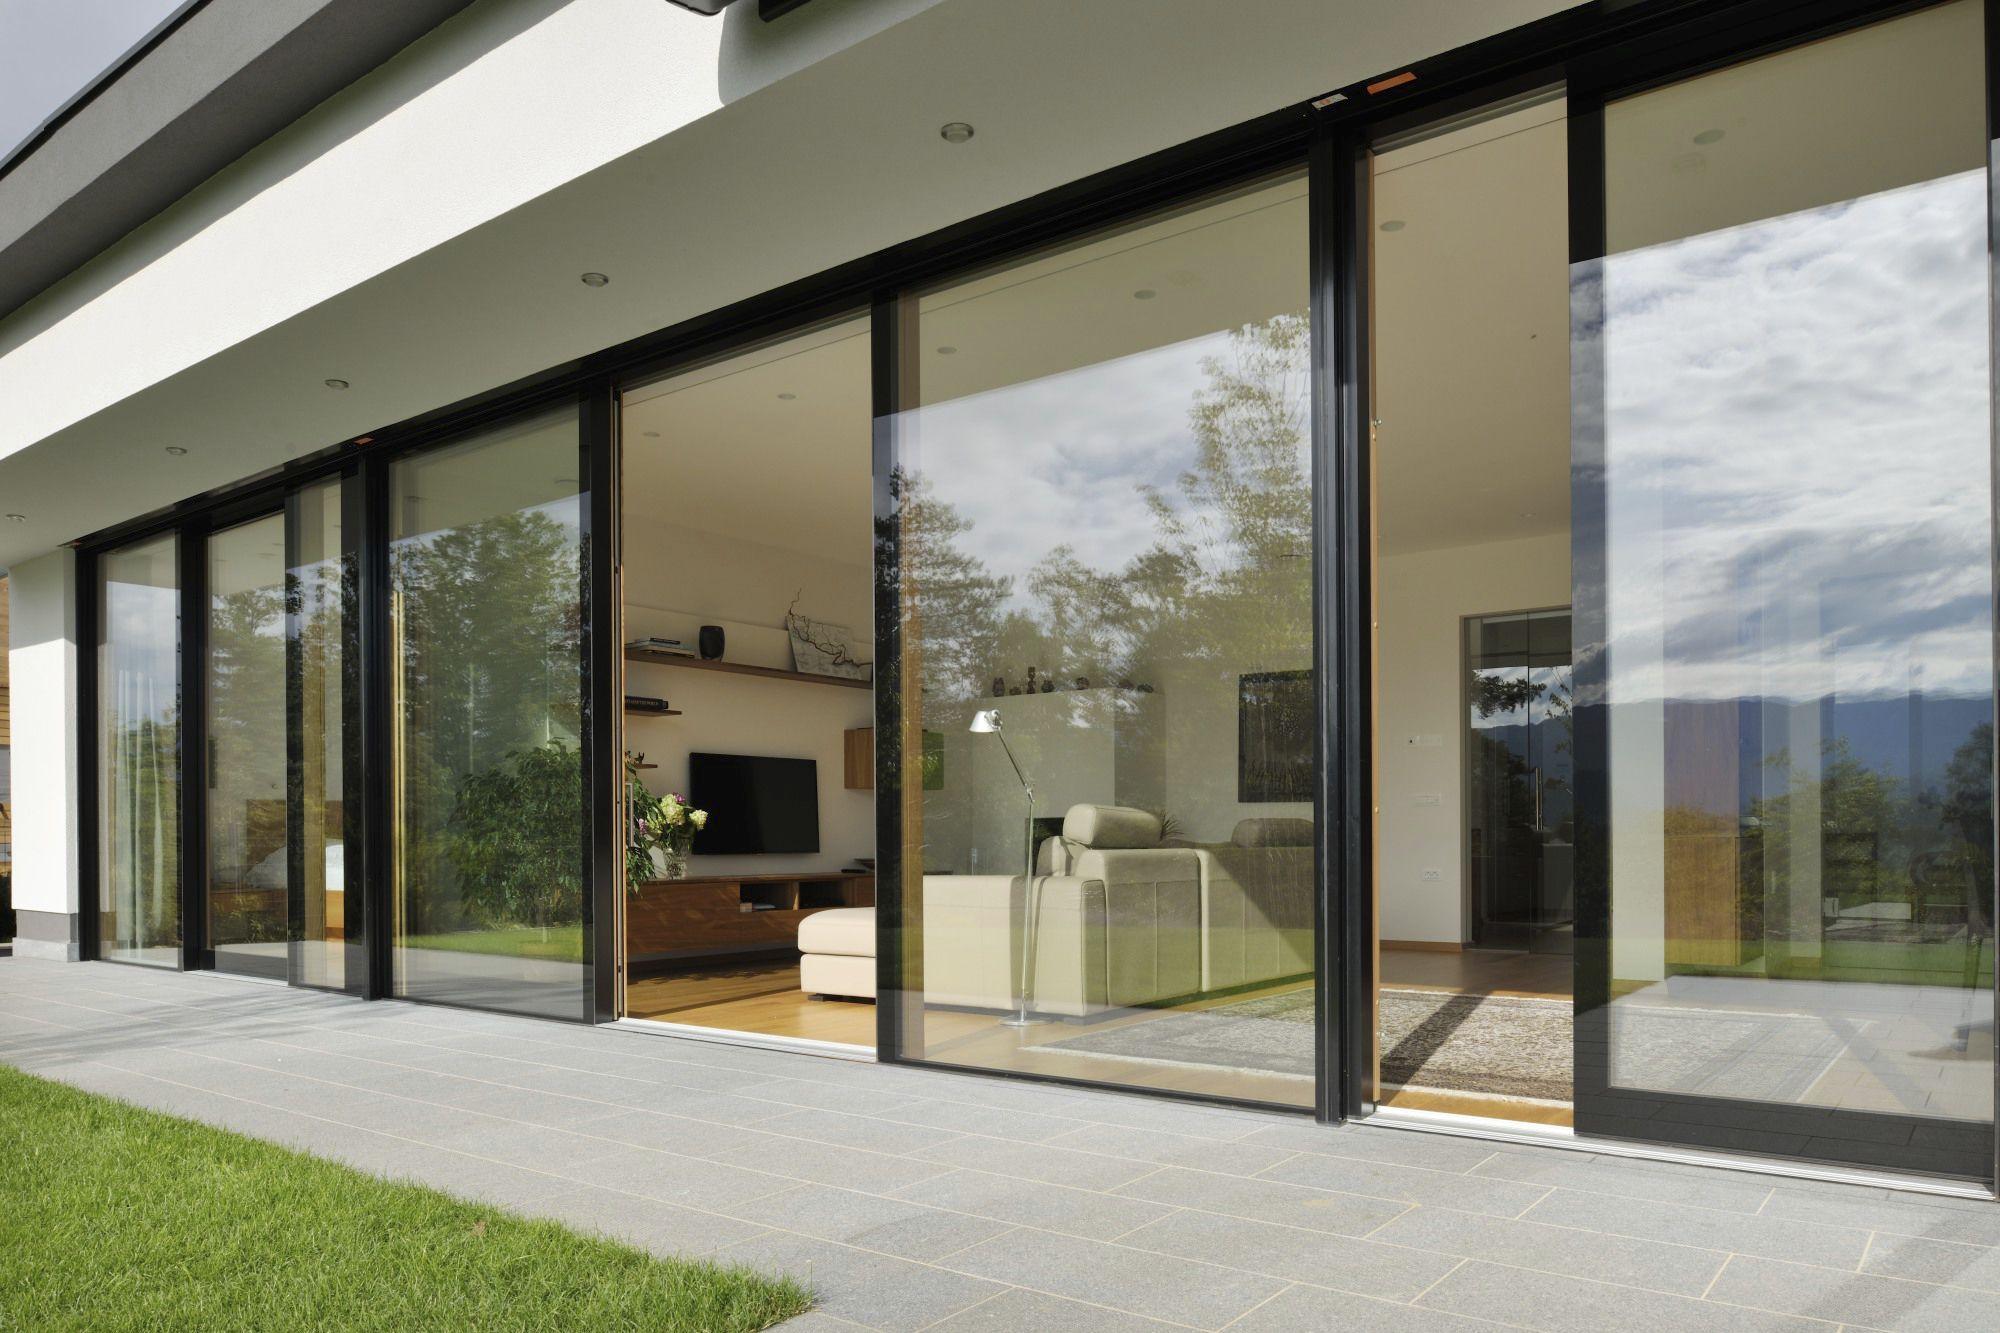 Sliding patio door aluminum double glazed VISION M SORA